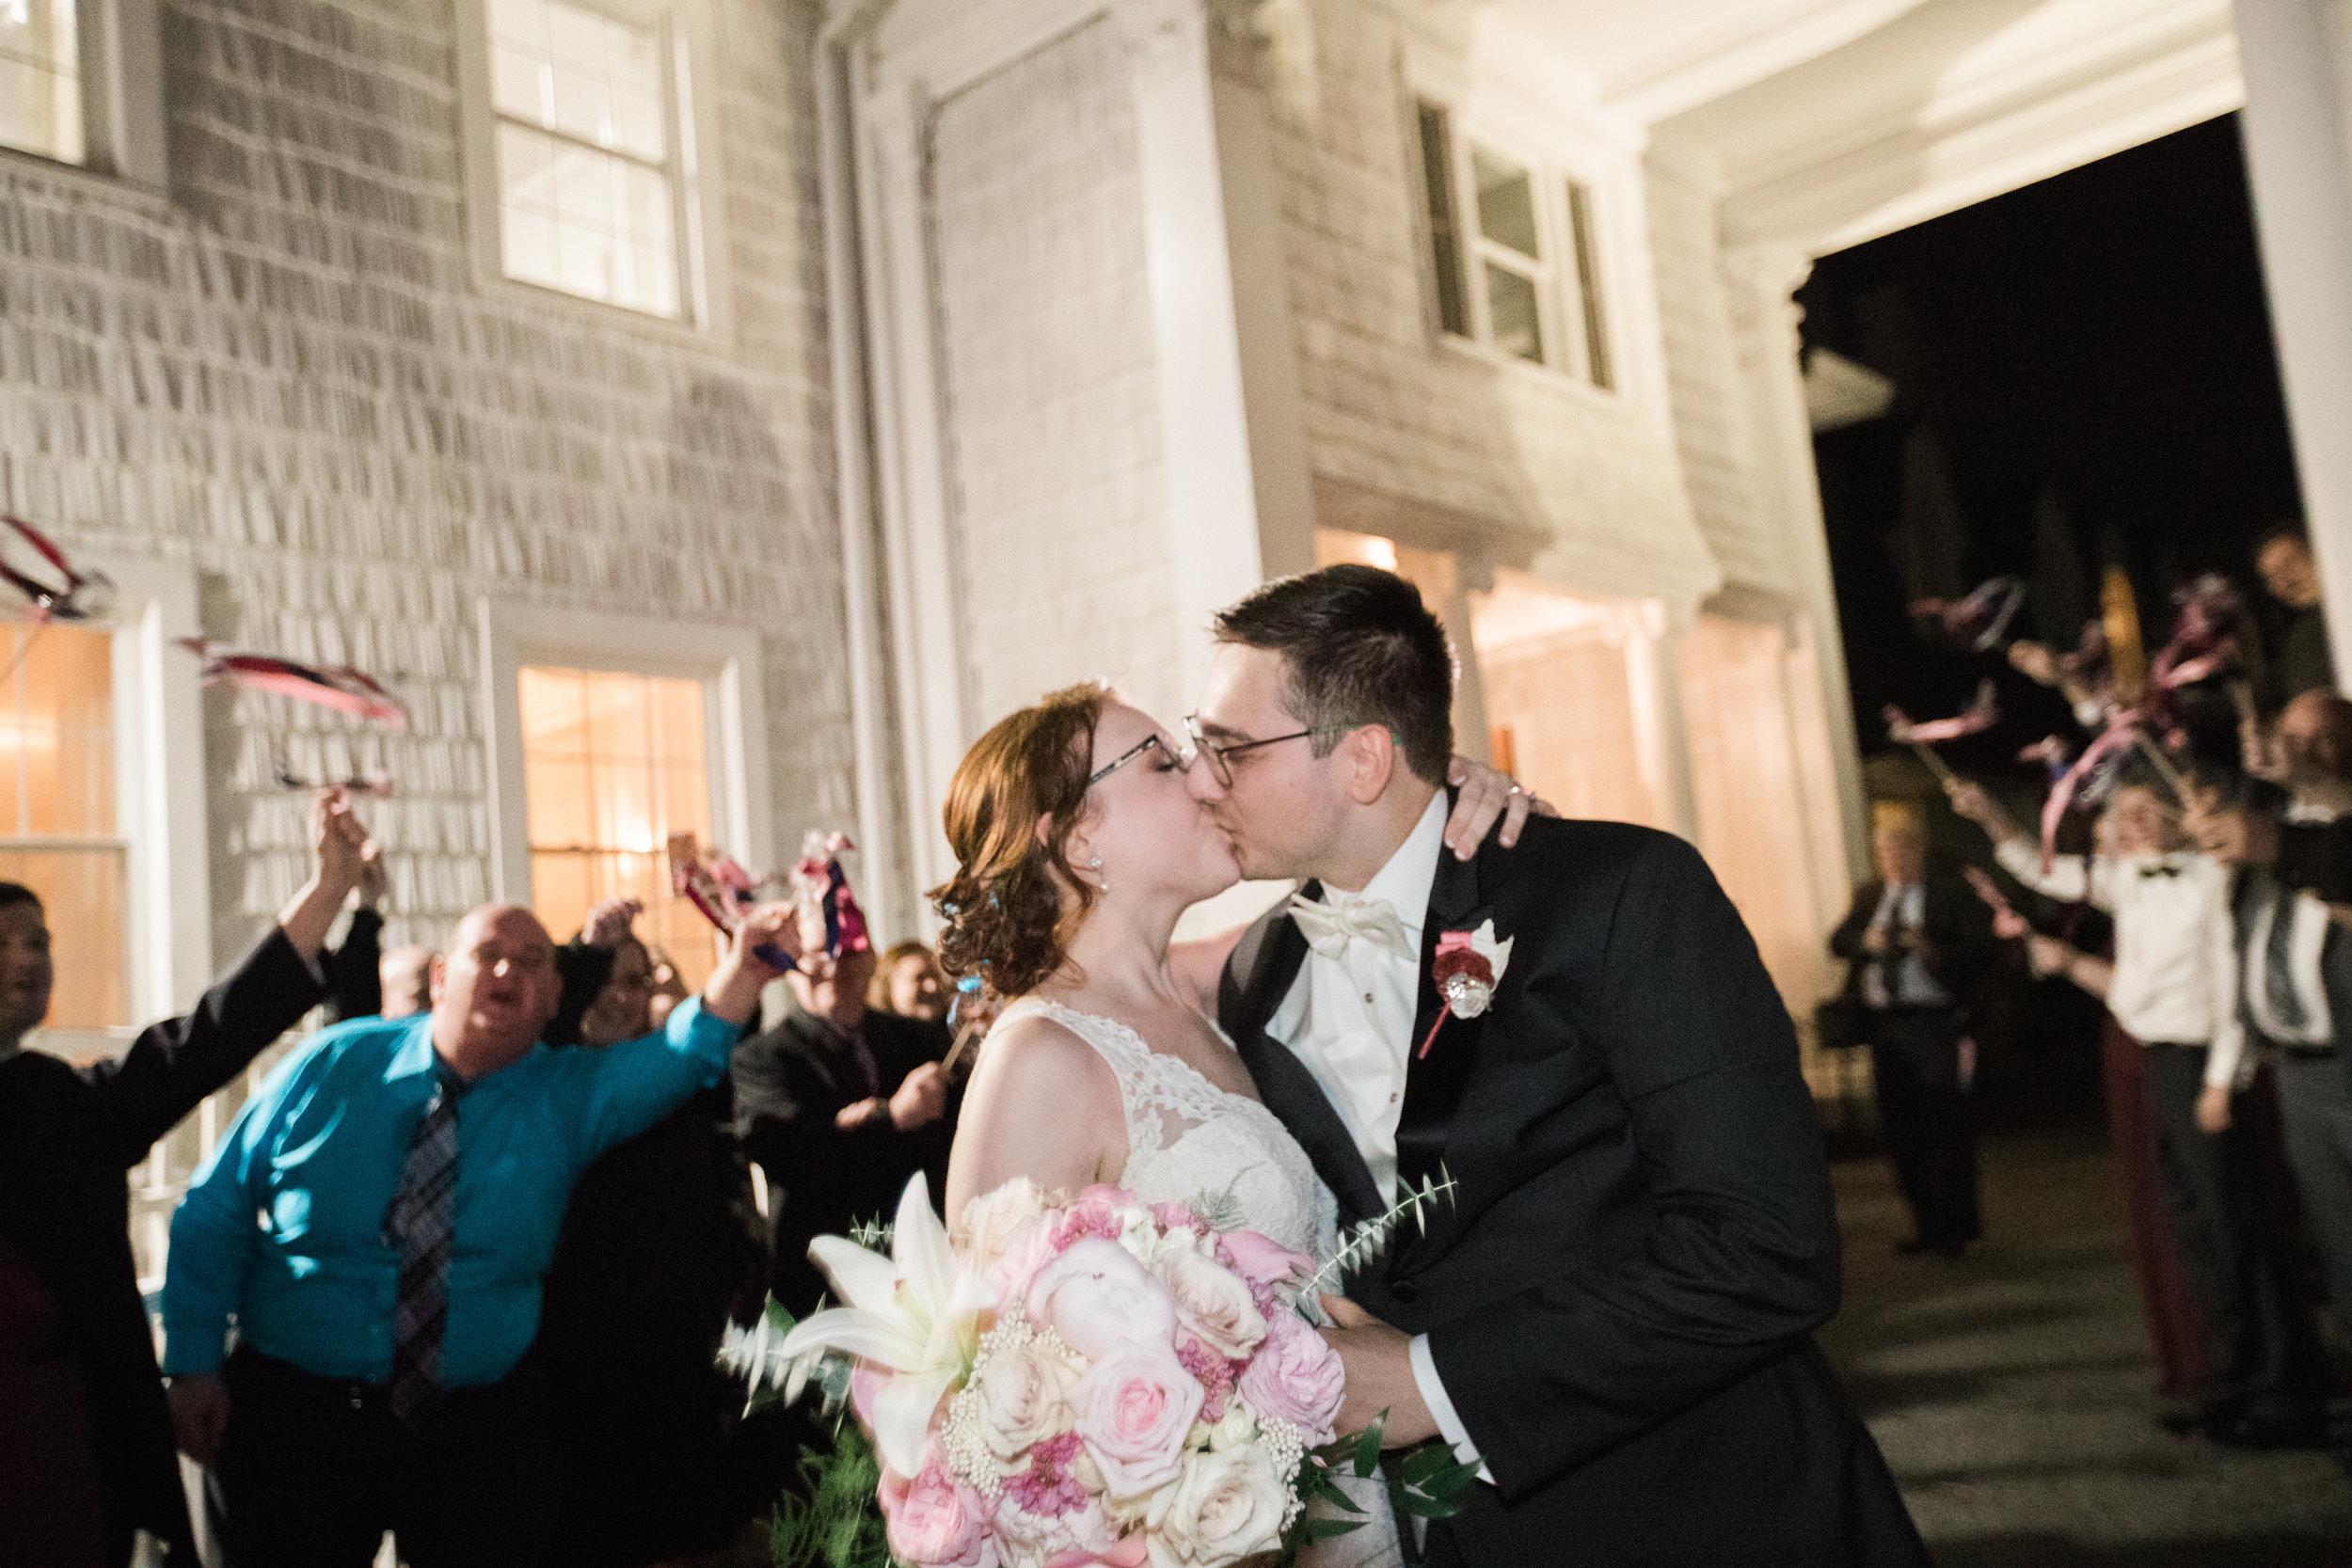 Harry Potter Wedding at Overhills Mansion Catonville Maryland Wedding Photographers Megapixels Media (134 of 134).jpg